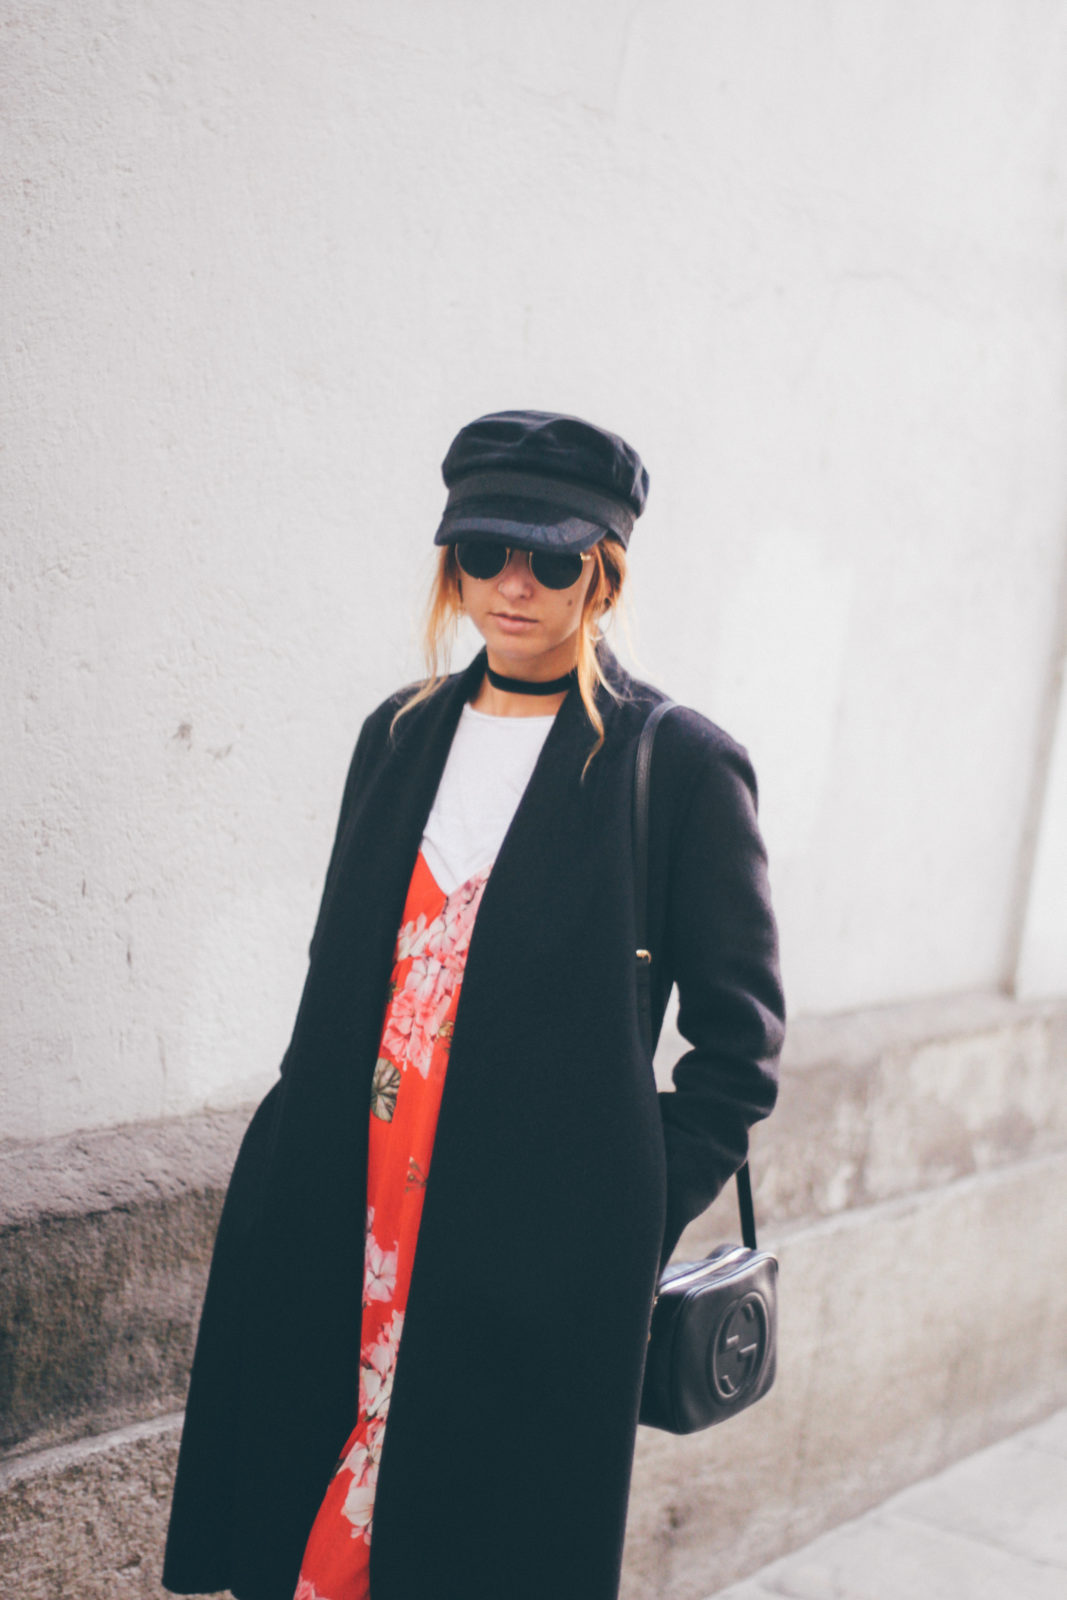 baker_boy_hat_vestido_con_camiseta_gorra_marinera_botines_hebillas_fall_2016_trends_street_style_outfits_donkeycool-26